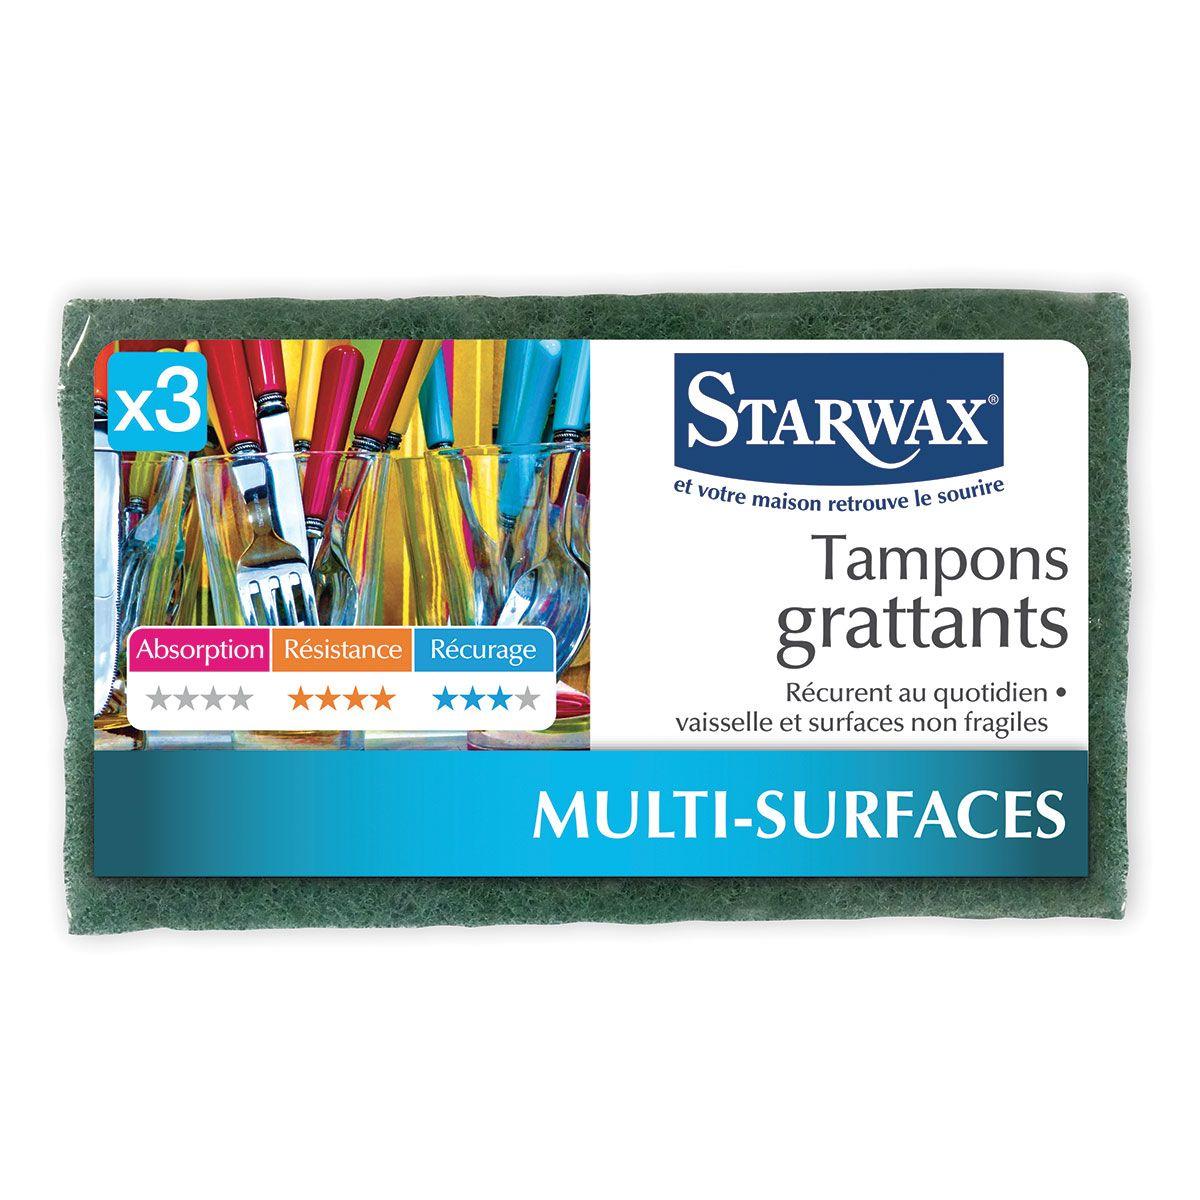 Tampons grattants - Starwax